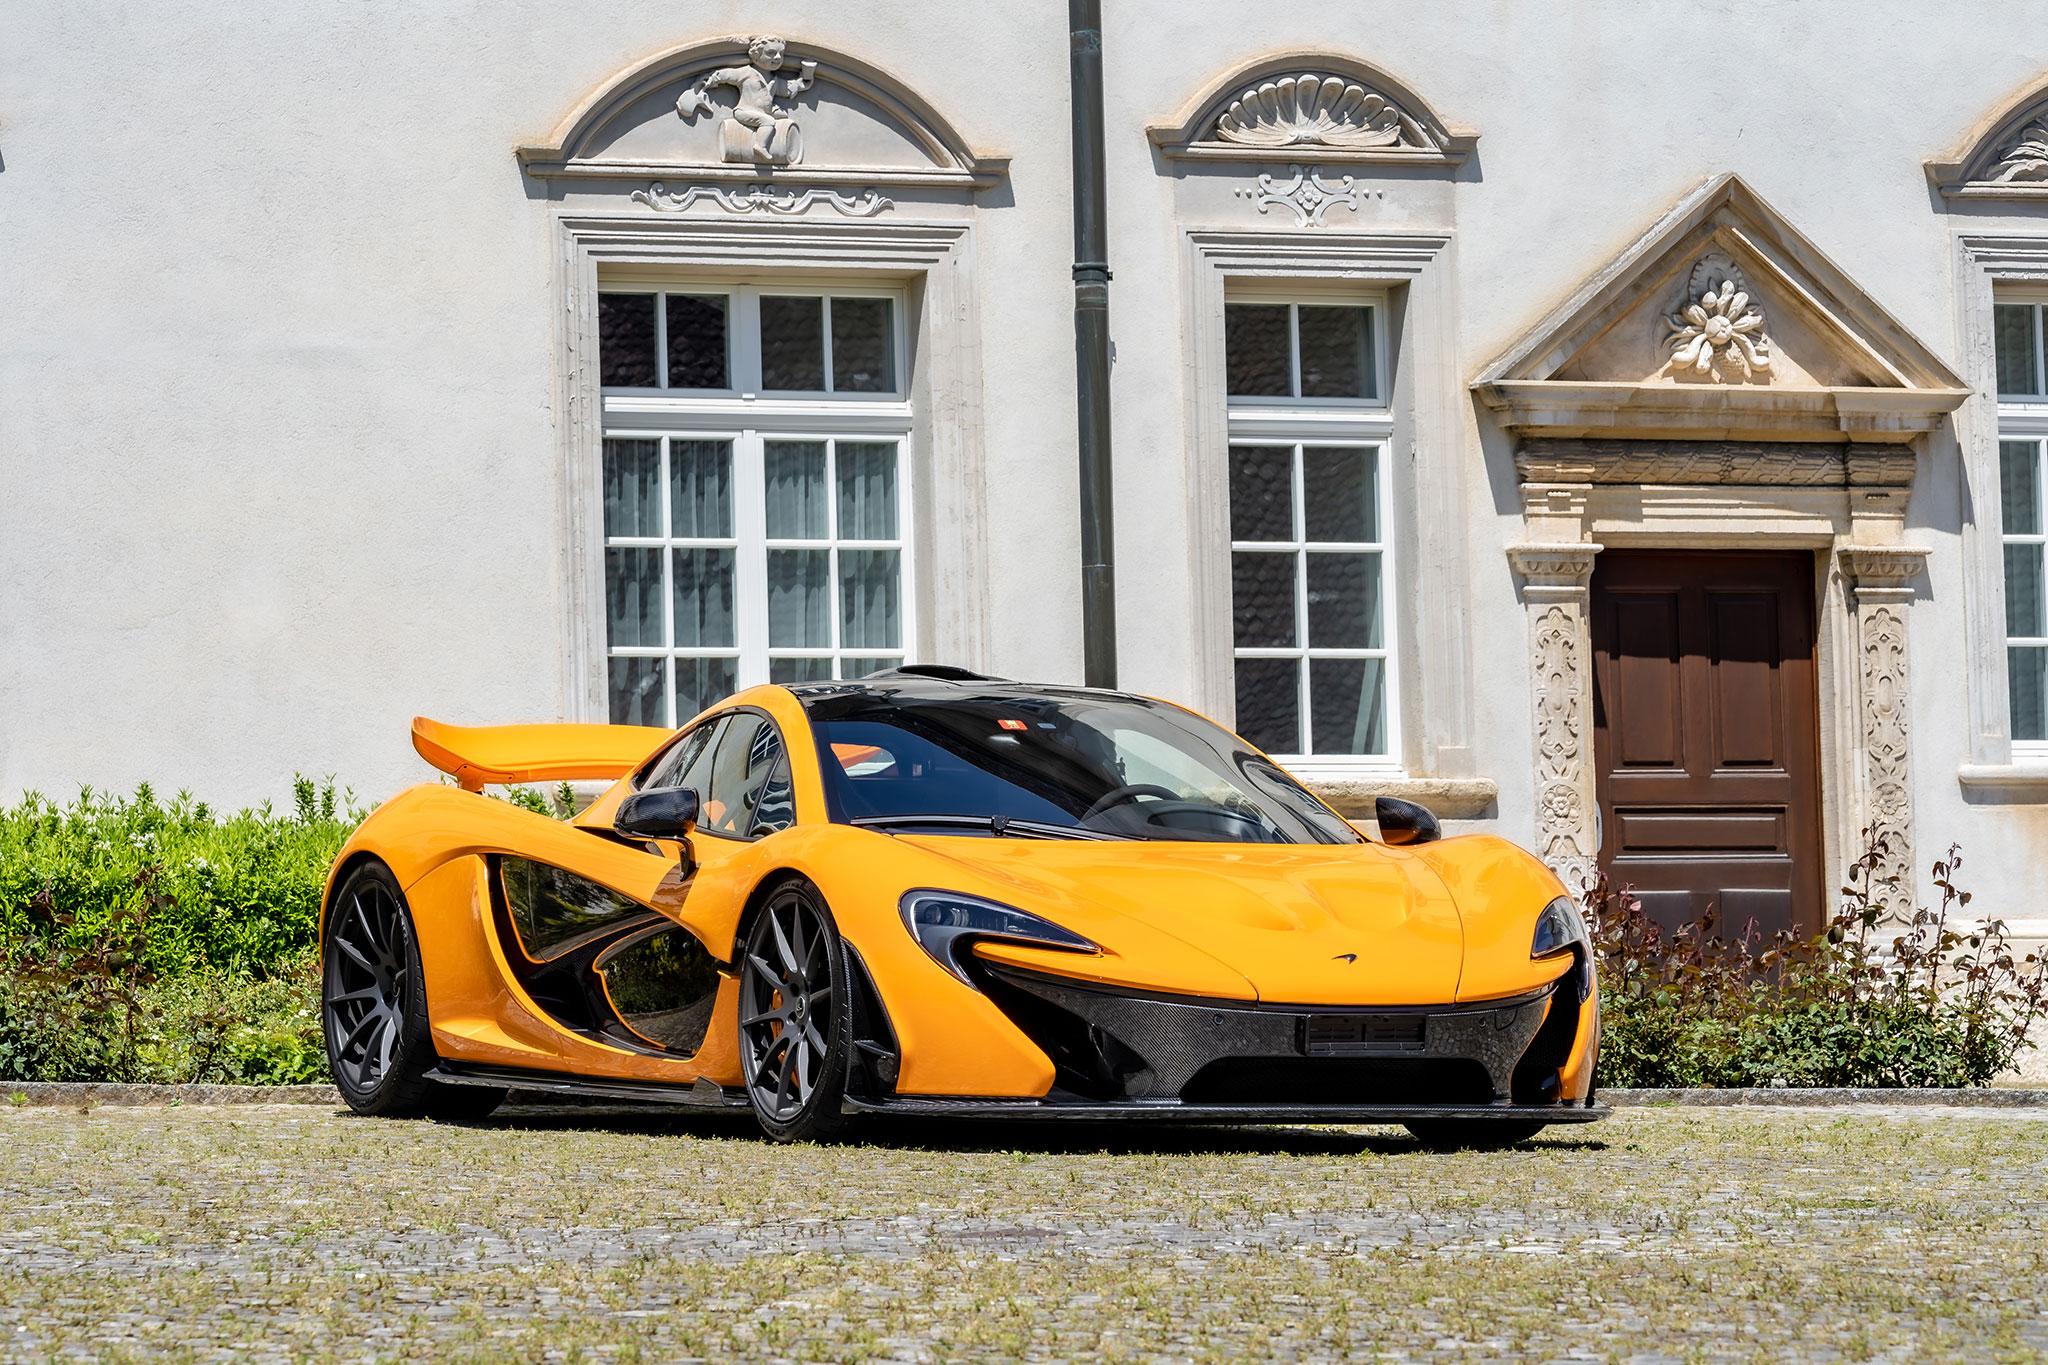 2014 McLaren P1 N° 180 CHF 1 200 000 - 1 500 000 - Classique vs Supercar.